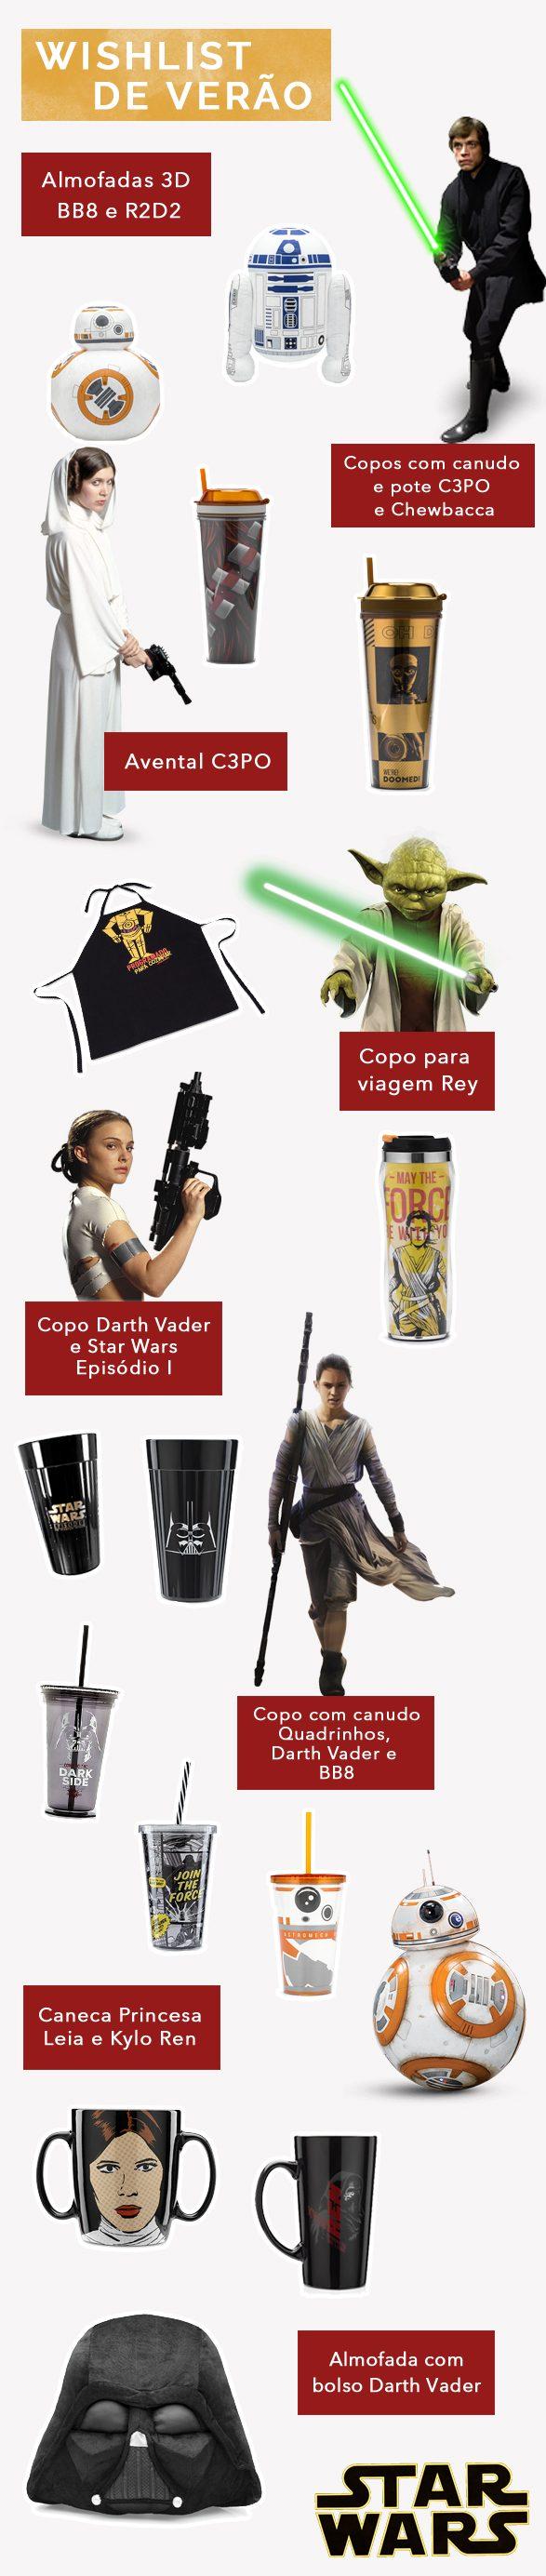 desejo-nerd-imaginarium-star-wars